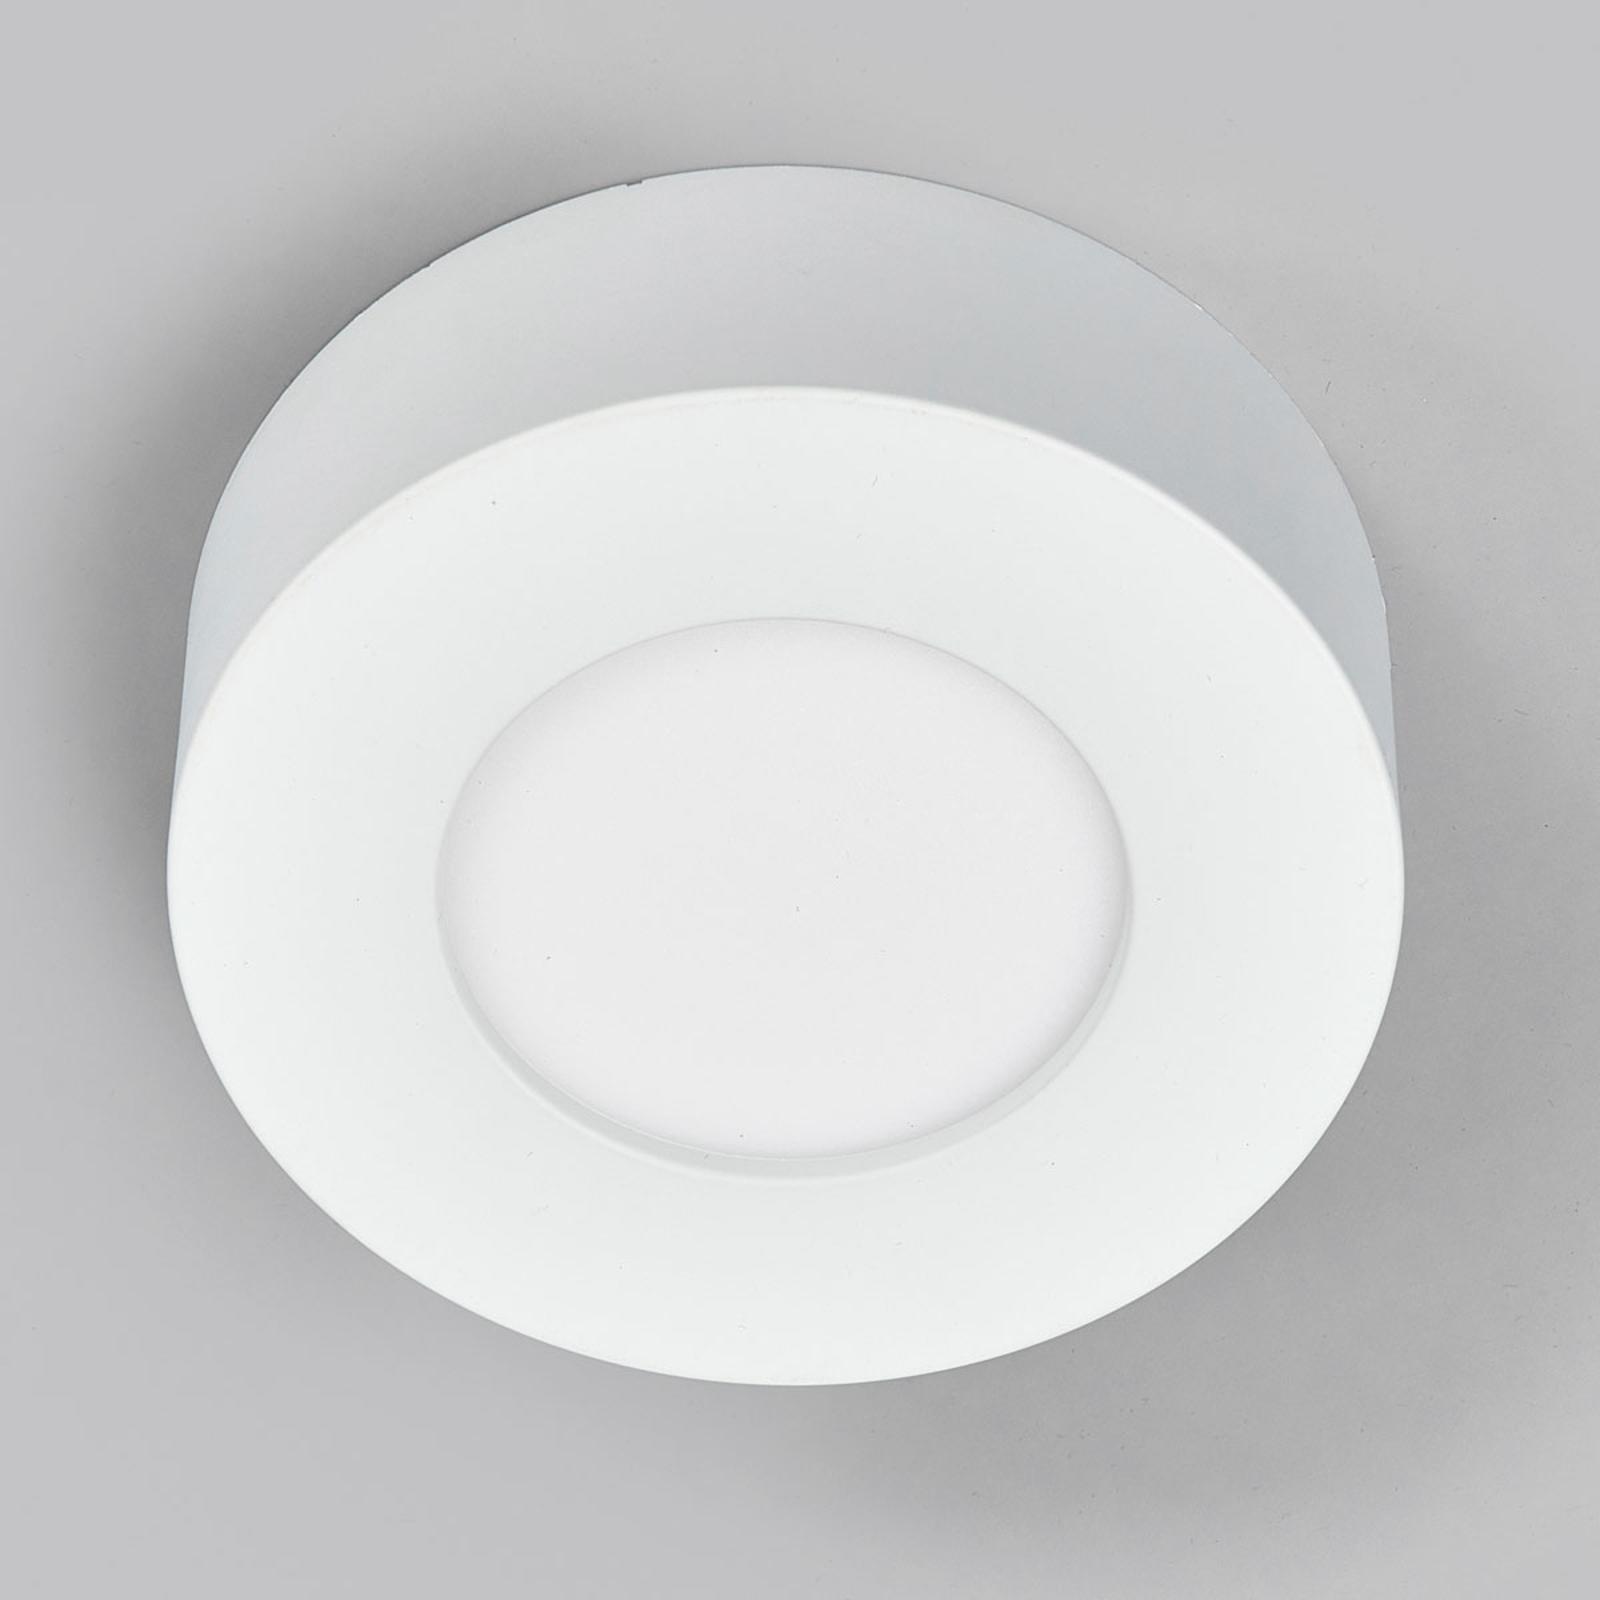 Plafonnier LED Marlo blanc 4000K rond 12,8cm